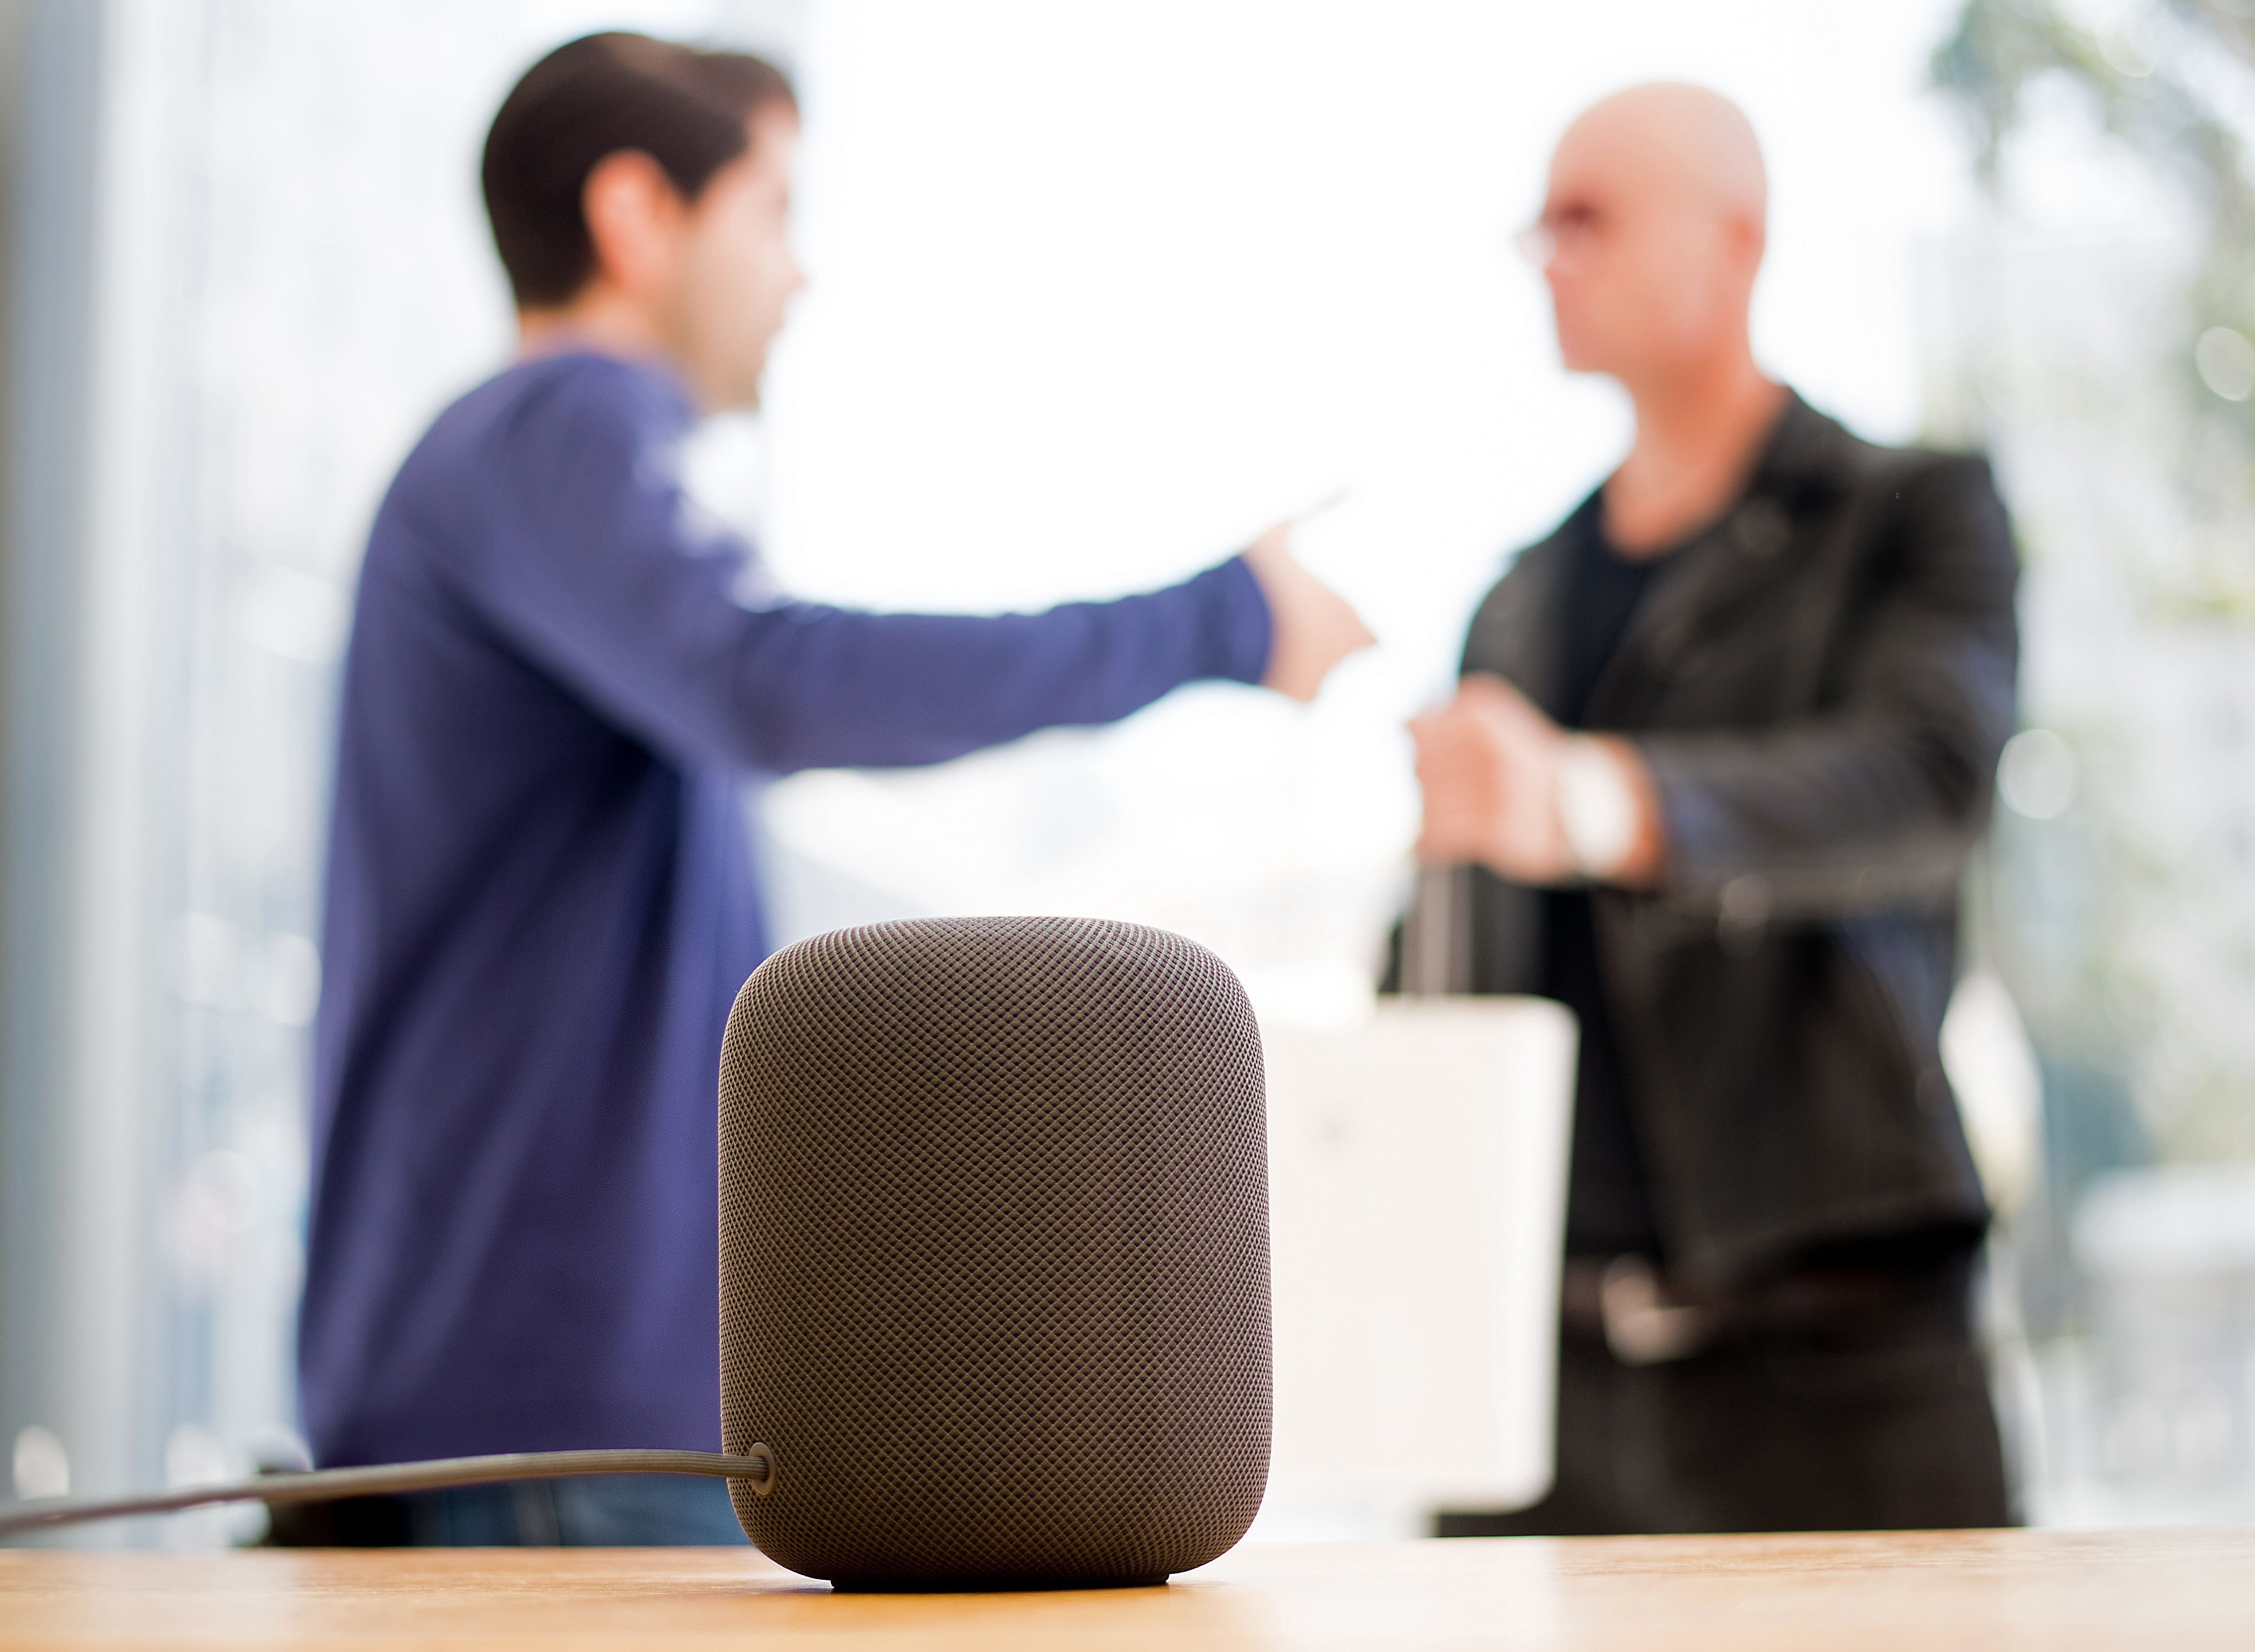 Apple HomePod Dominates HighEnd of Smart Speaker Market